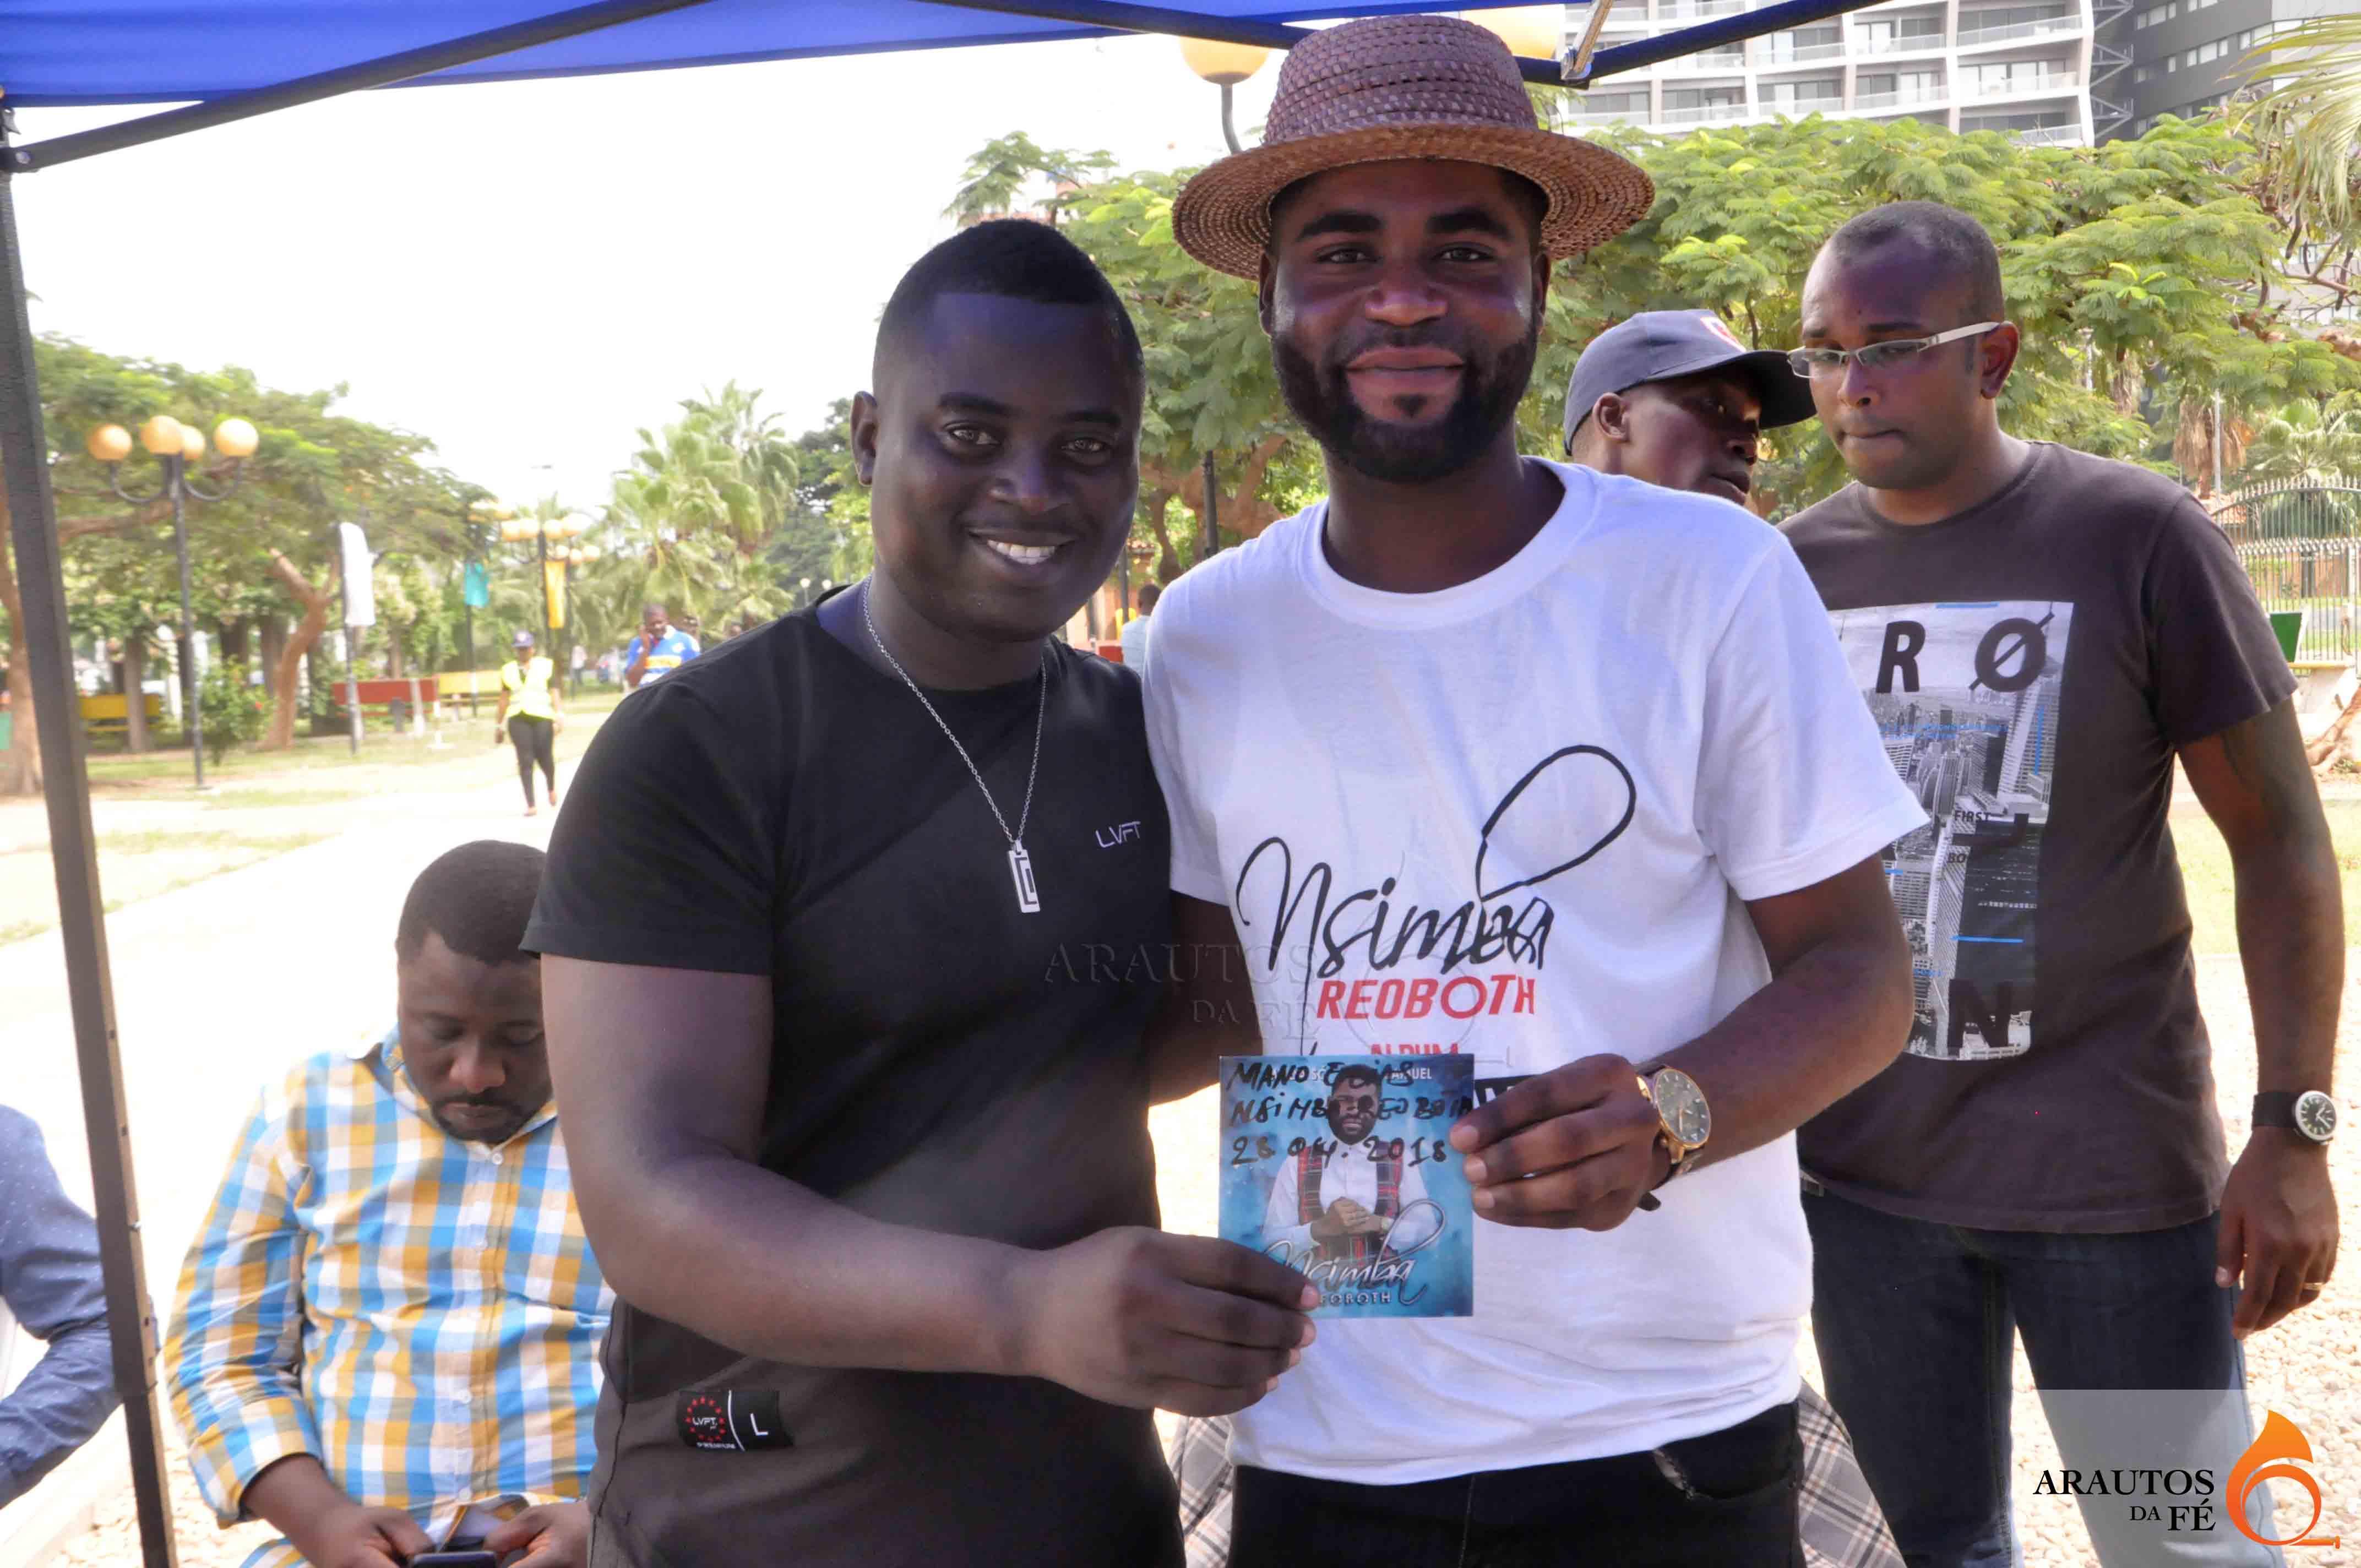 Nelson Elias e Nsimba Reoboth. (Foto: Jaime Chiquito)